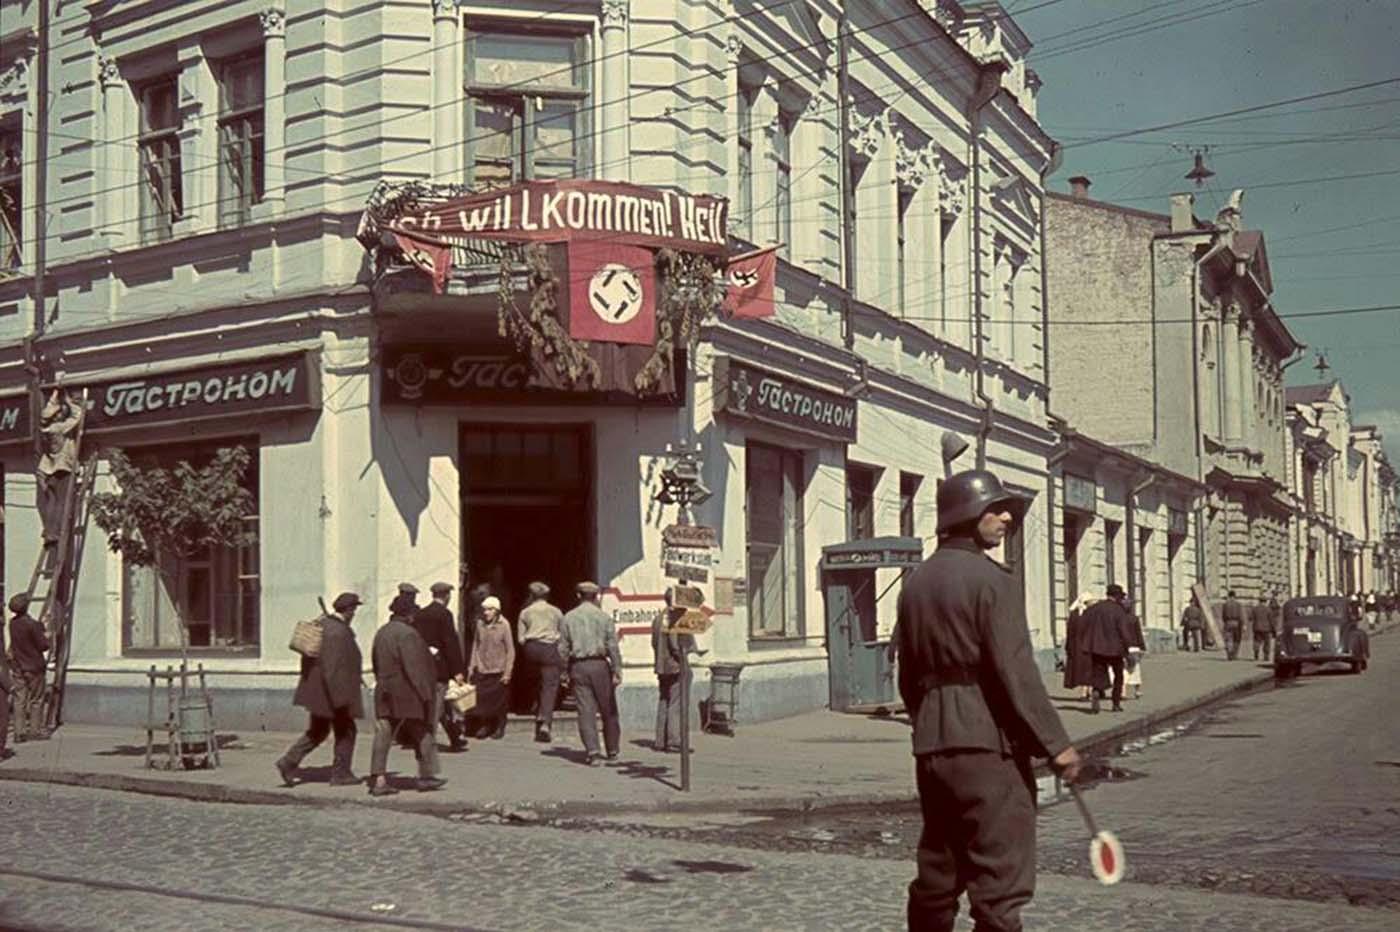 Director de tráfico alemán, Kharkov, Ucrania.